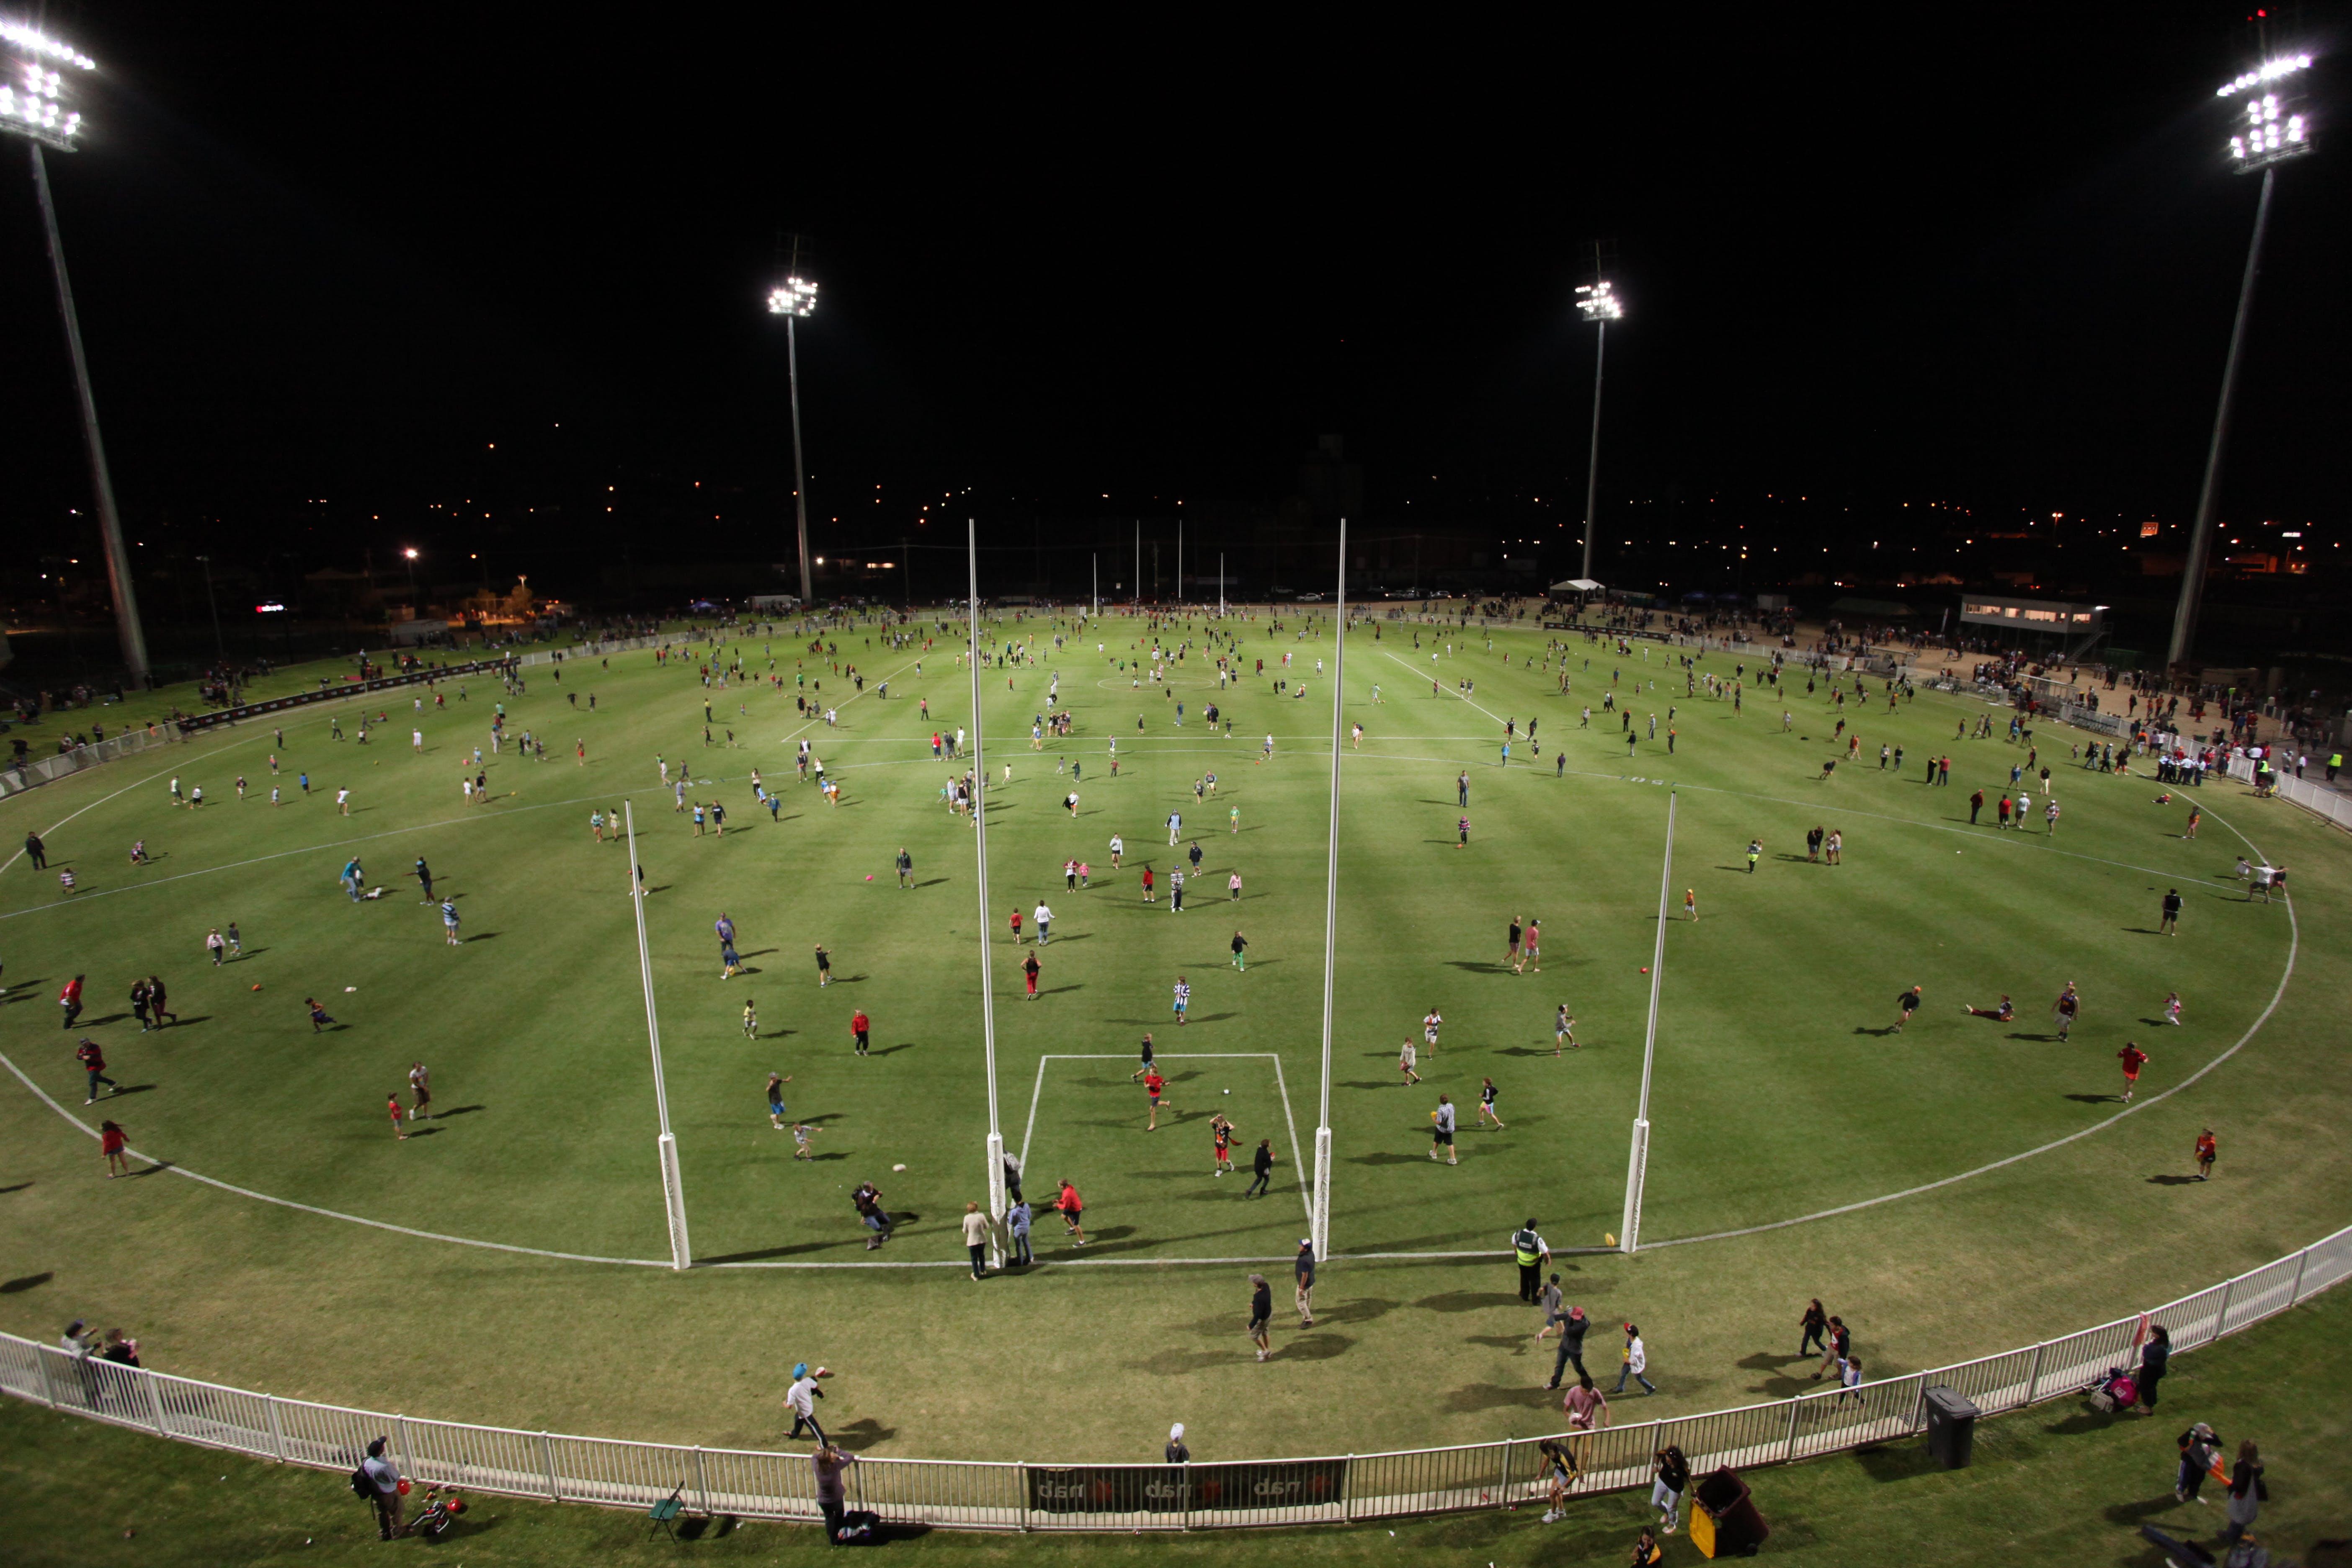 Robertson Oval at night